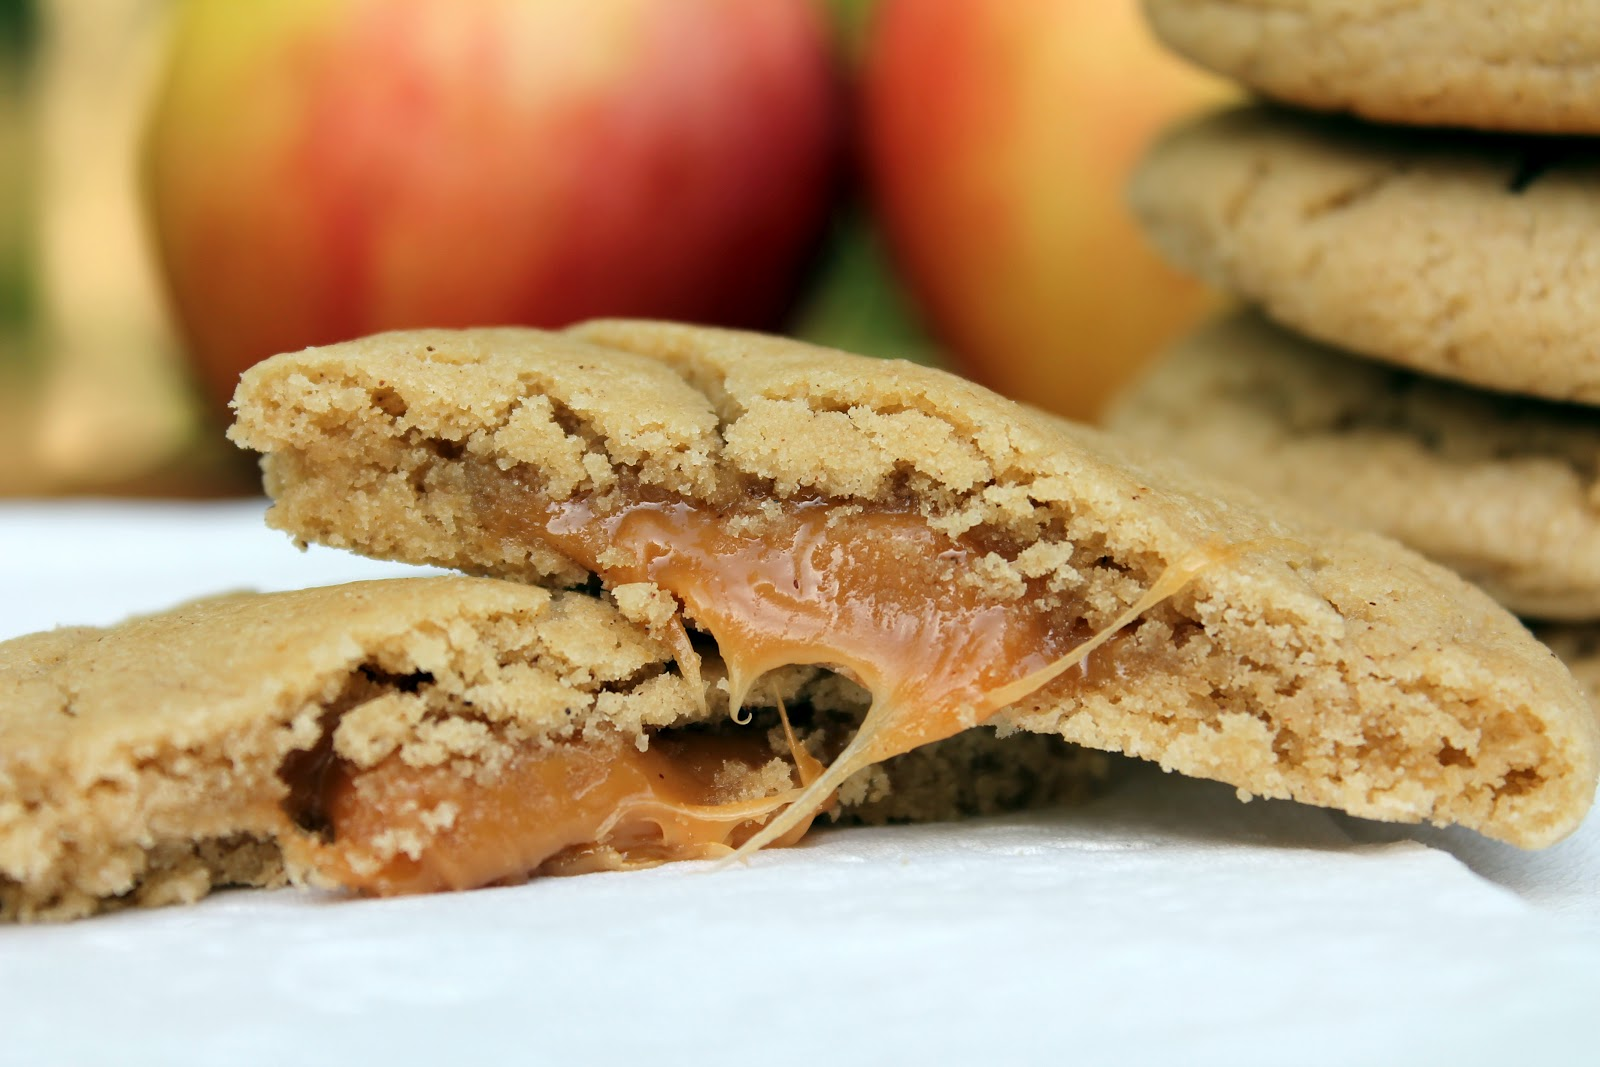 Bakestravaganza: Apple Cider Caramel Filled Cookies